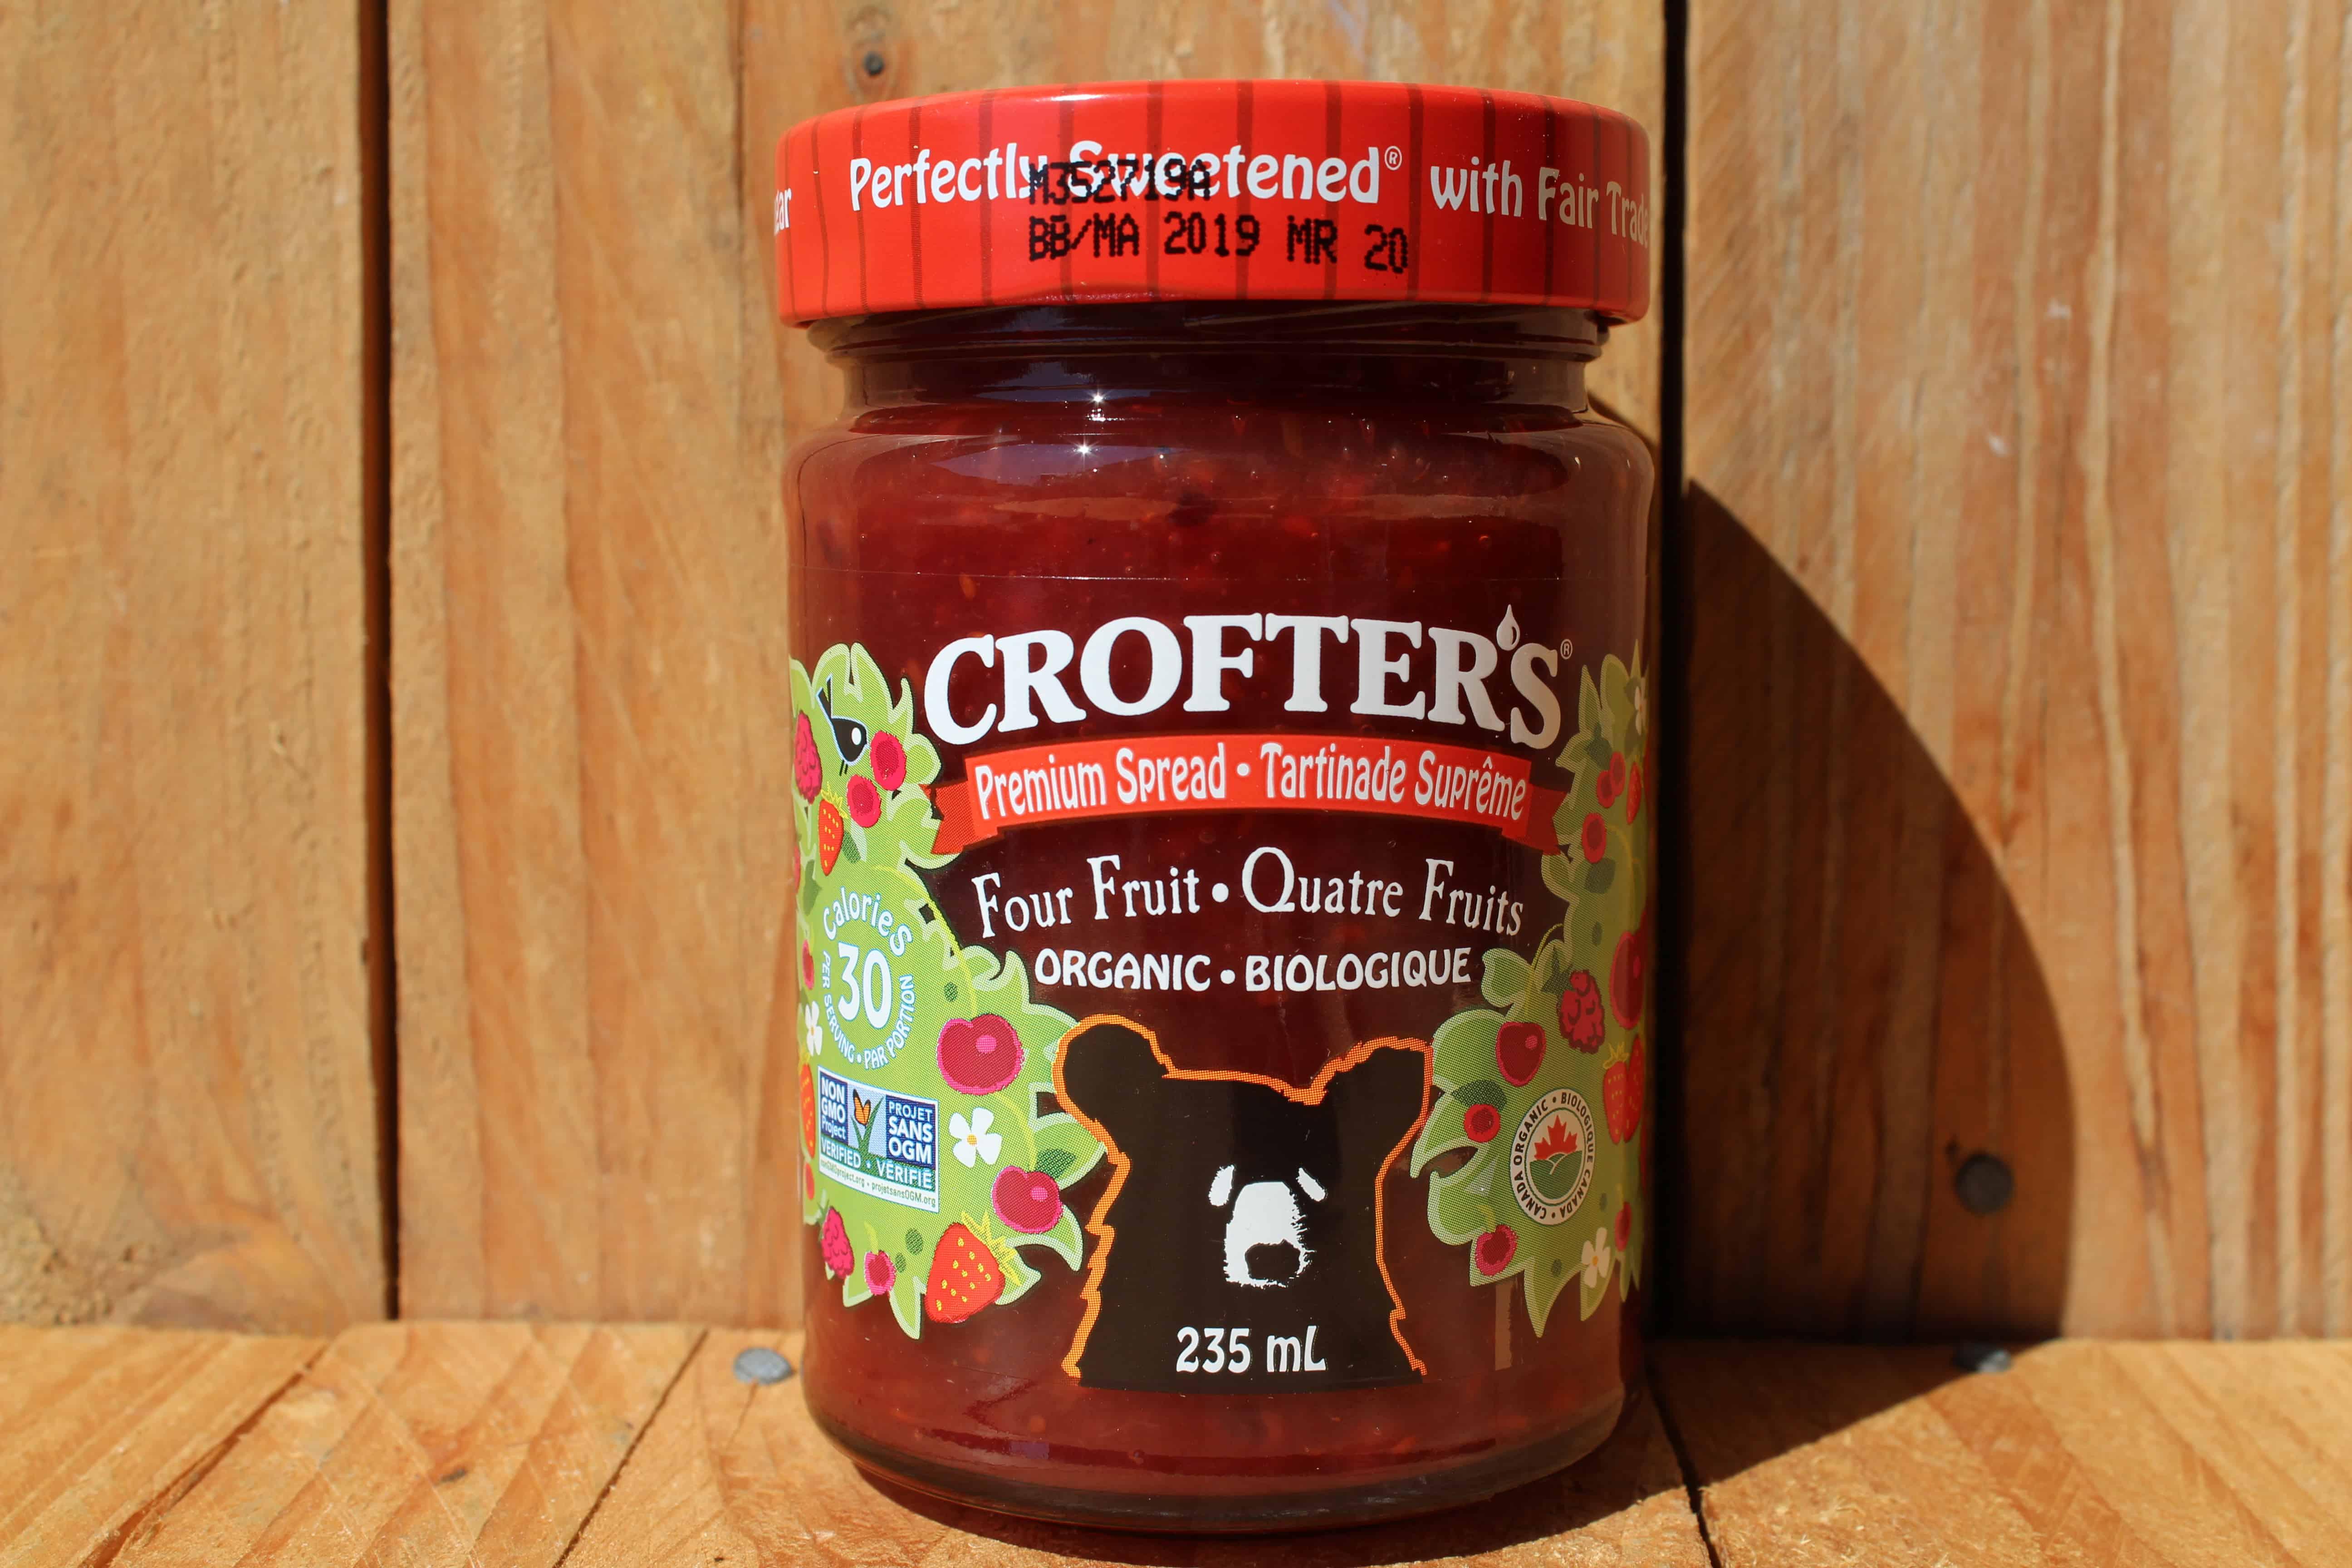 Crofters – Organic Premium Spread – Four Fruits (235ml Jar)